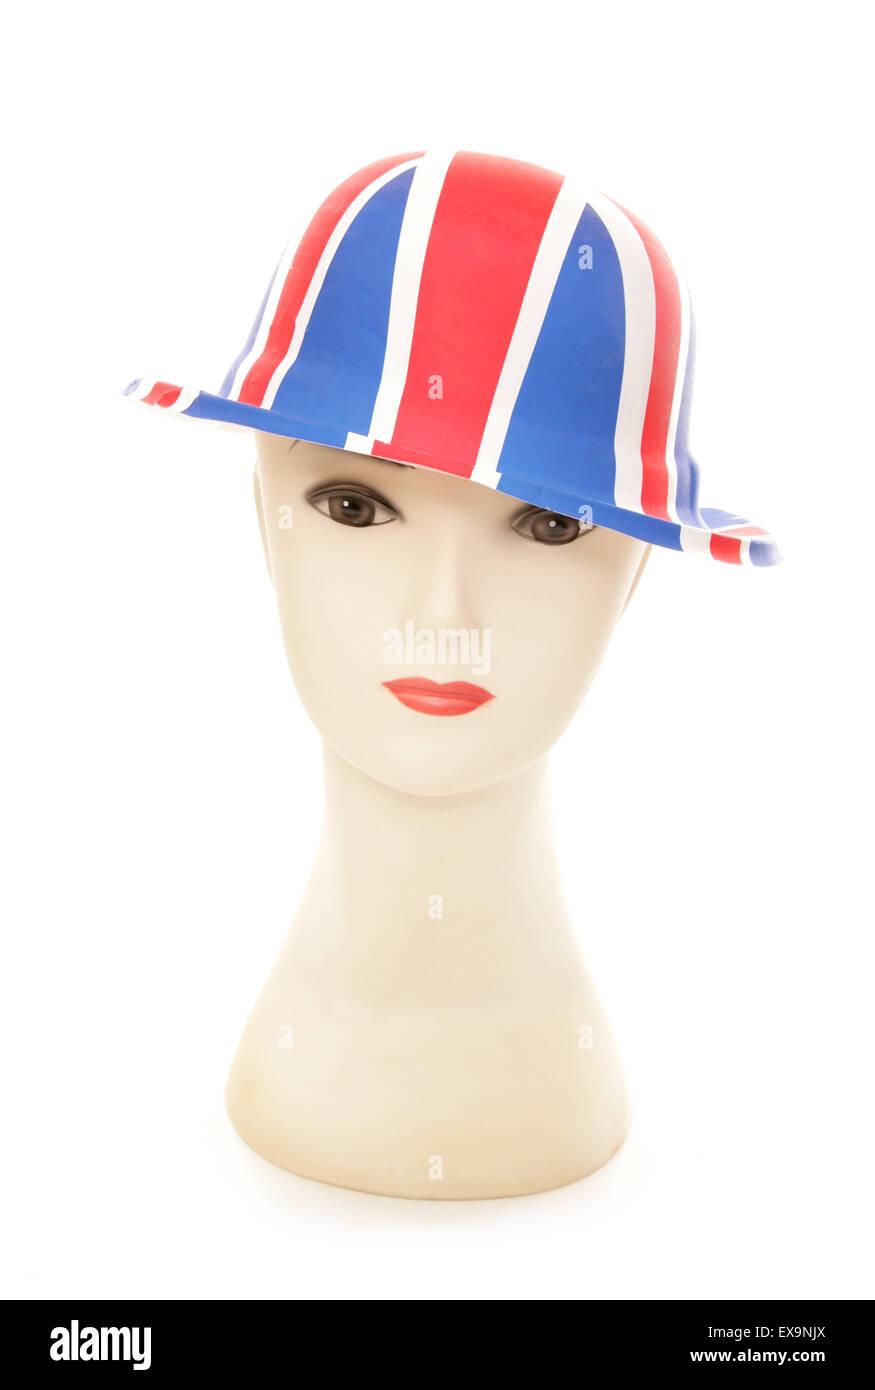 Bowler Hat Cut Out Stockfotos & Bowler Hat Cut Out Bilder - Alamy